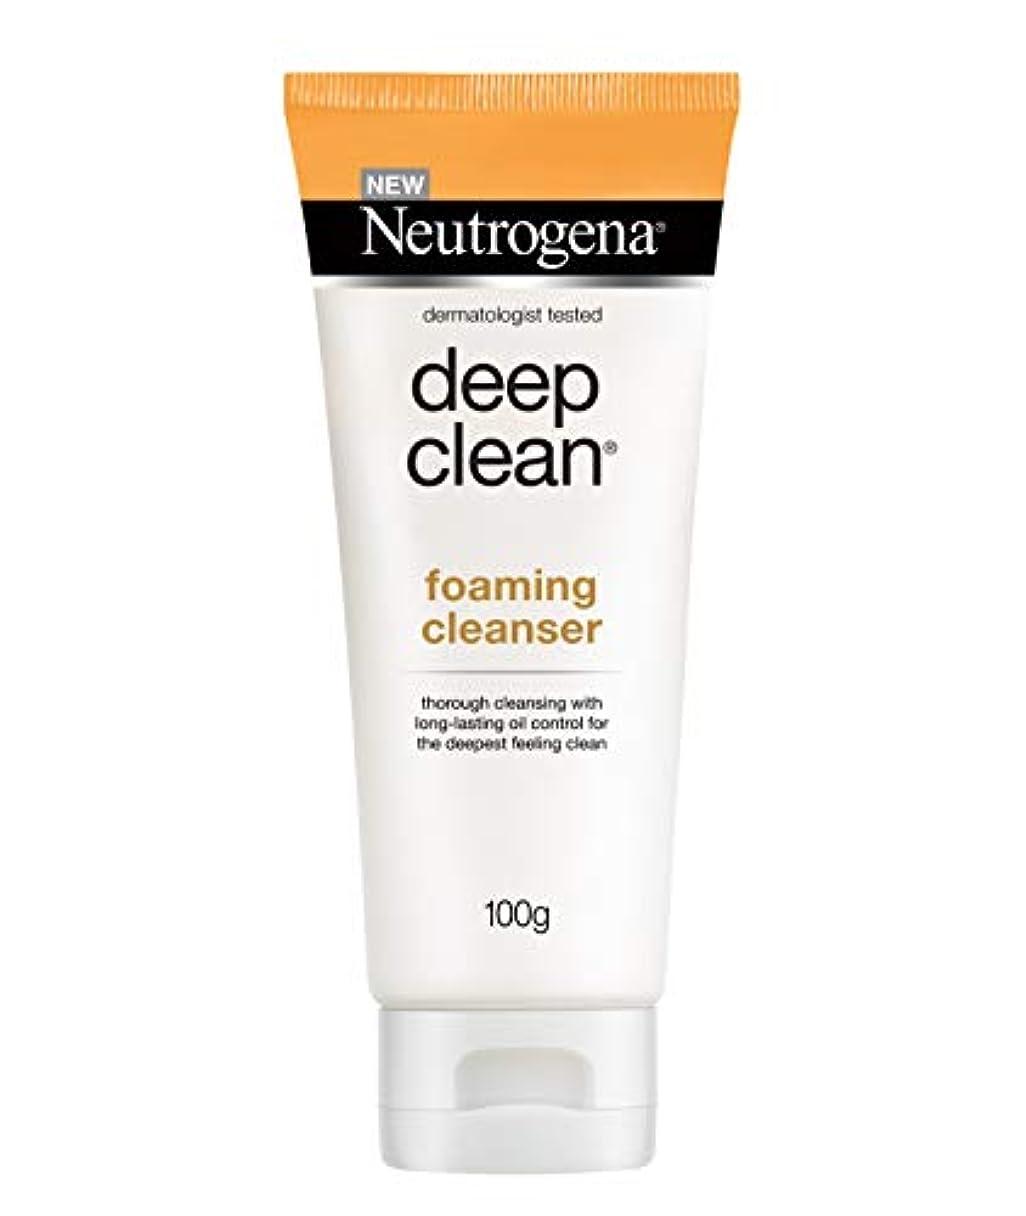 水平偉業拒否Neutrogena Deep Clean Foaming Cleanser, 100g